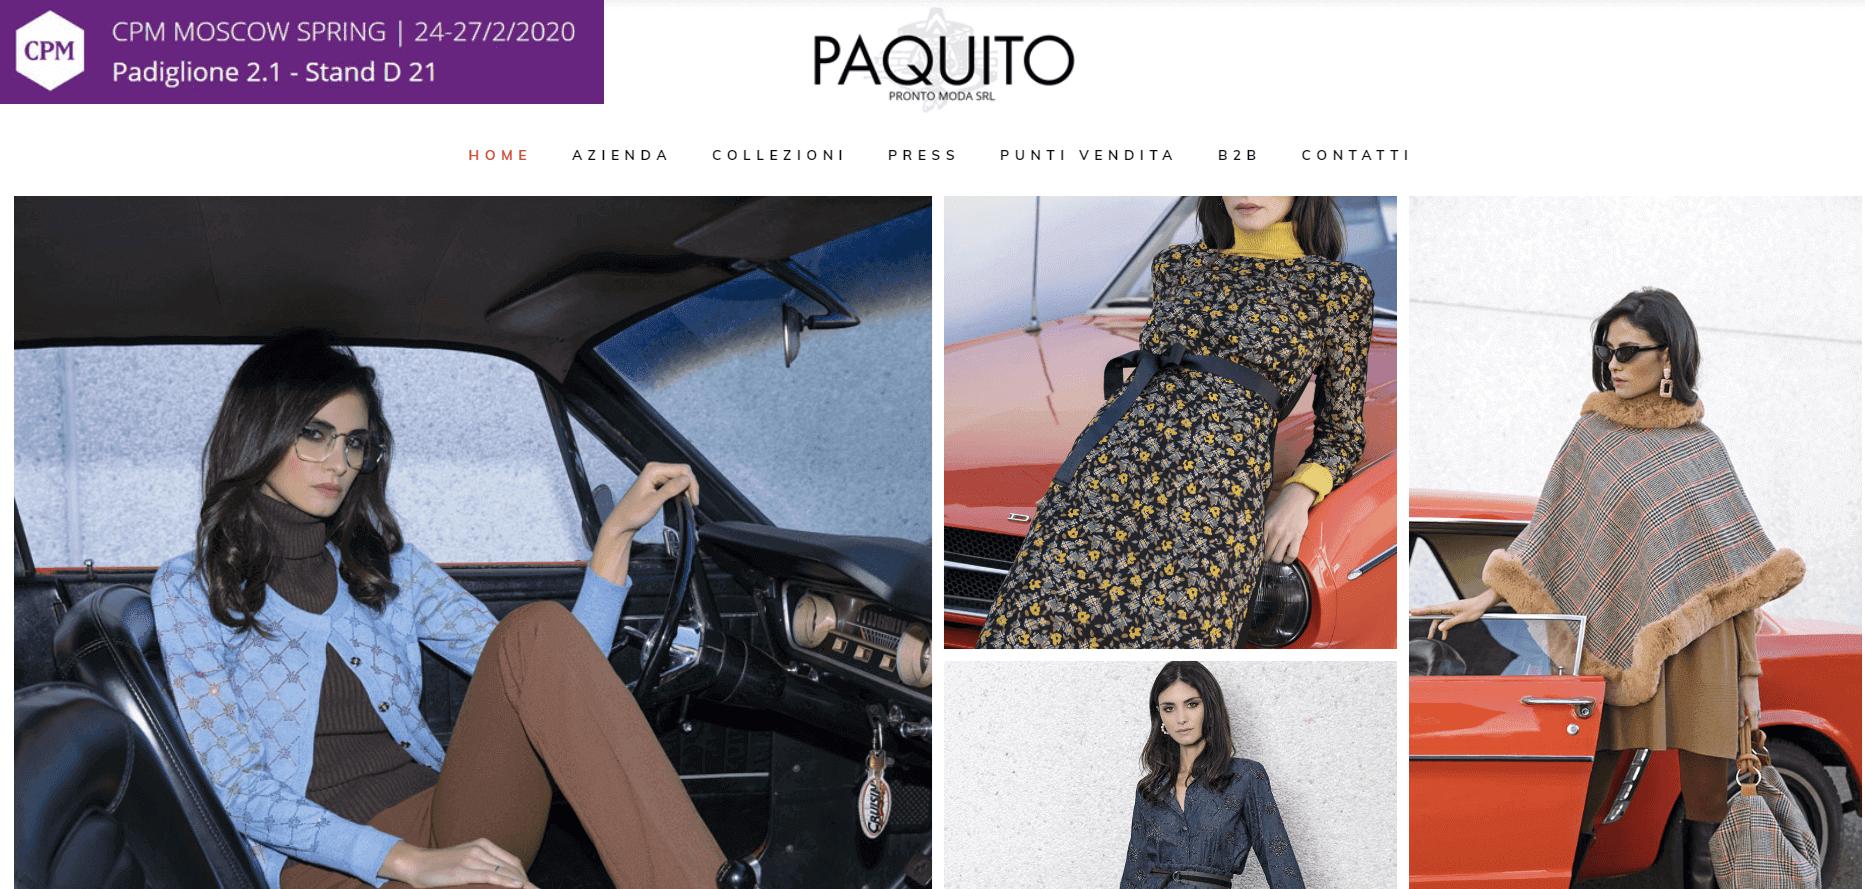 Paquito купити онлайн з доставкою в Україну - myMeest - 2